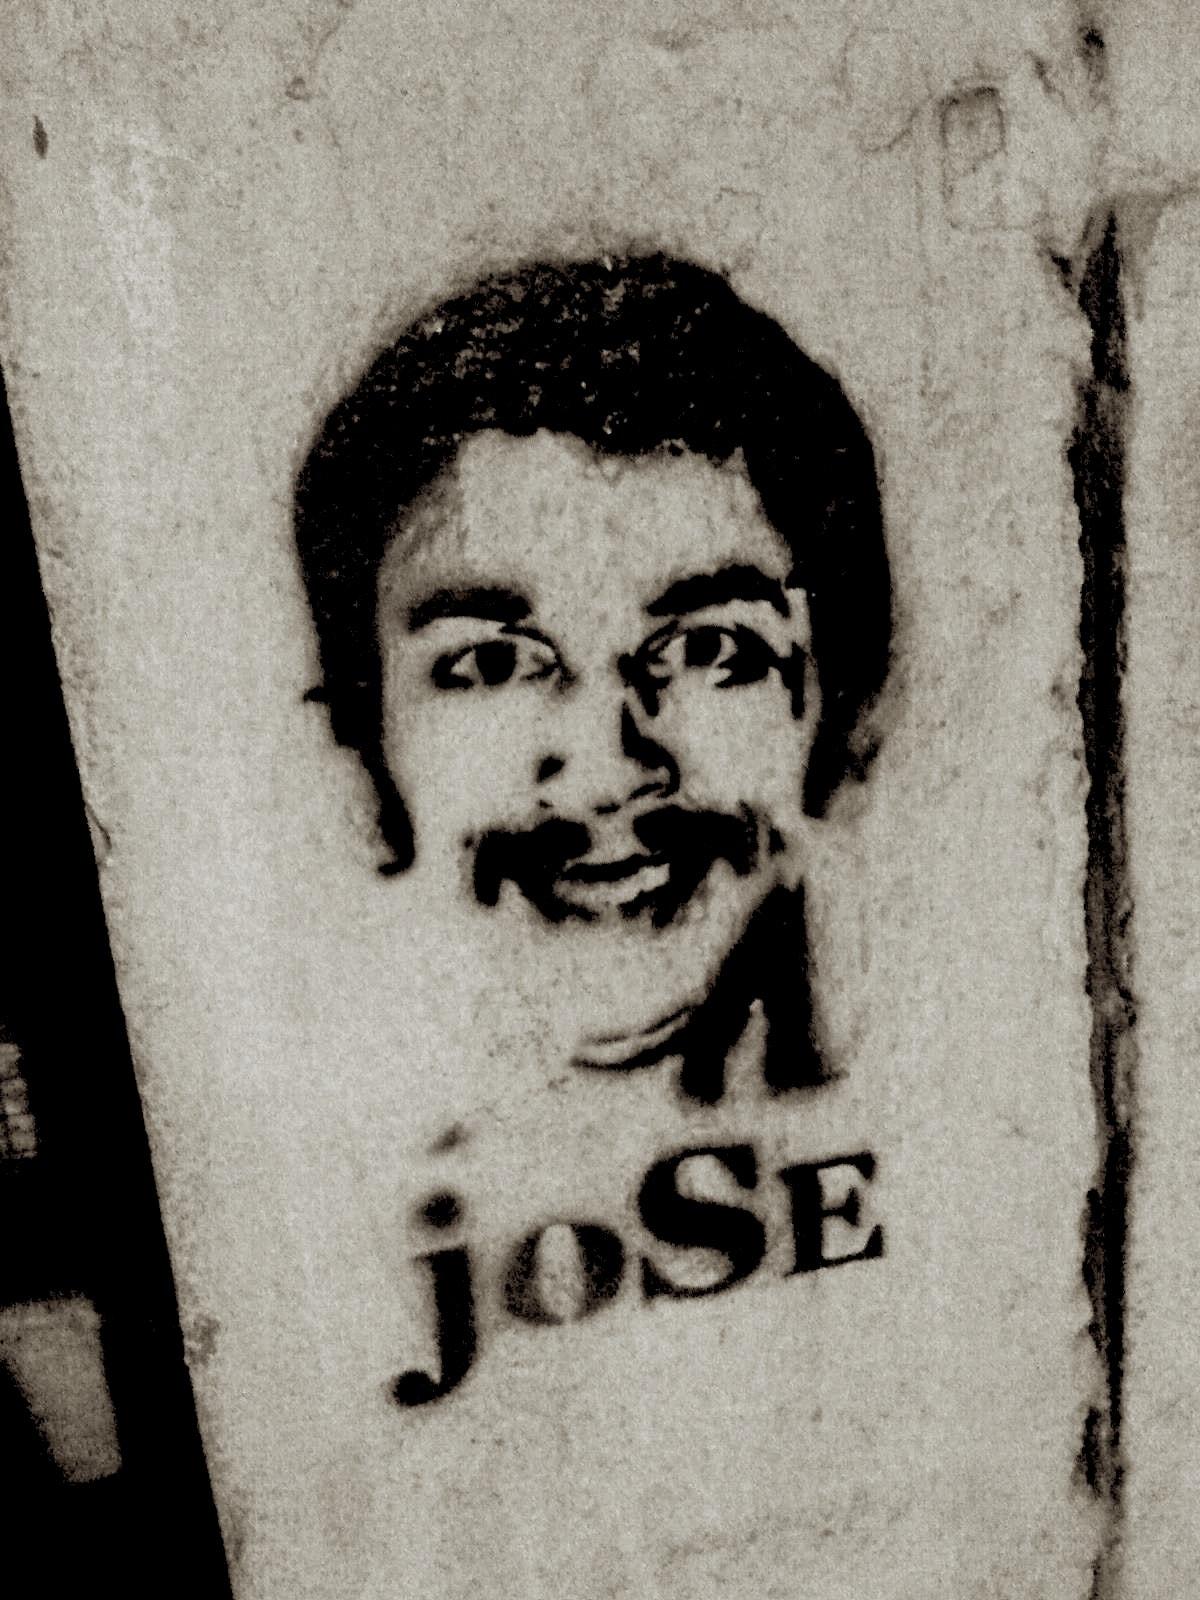 Jose from Paris